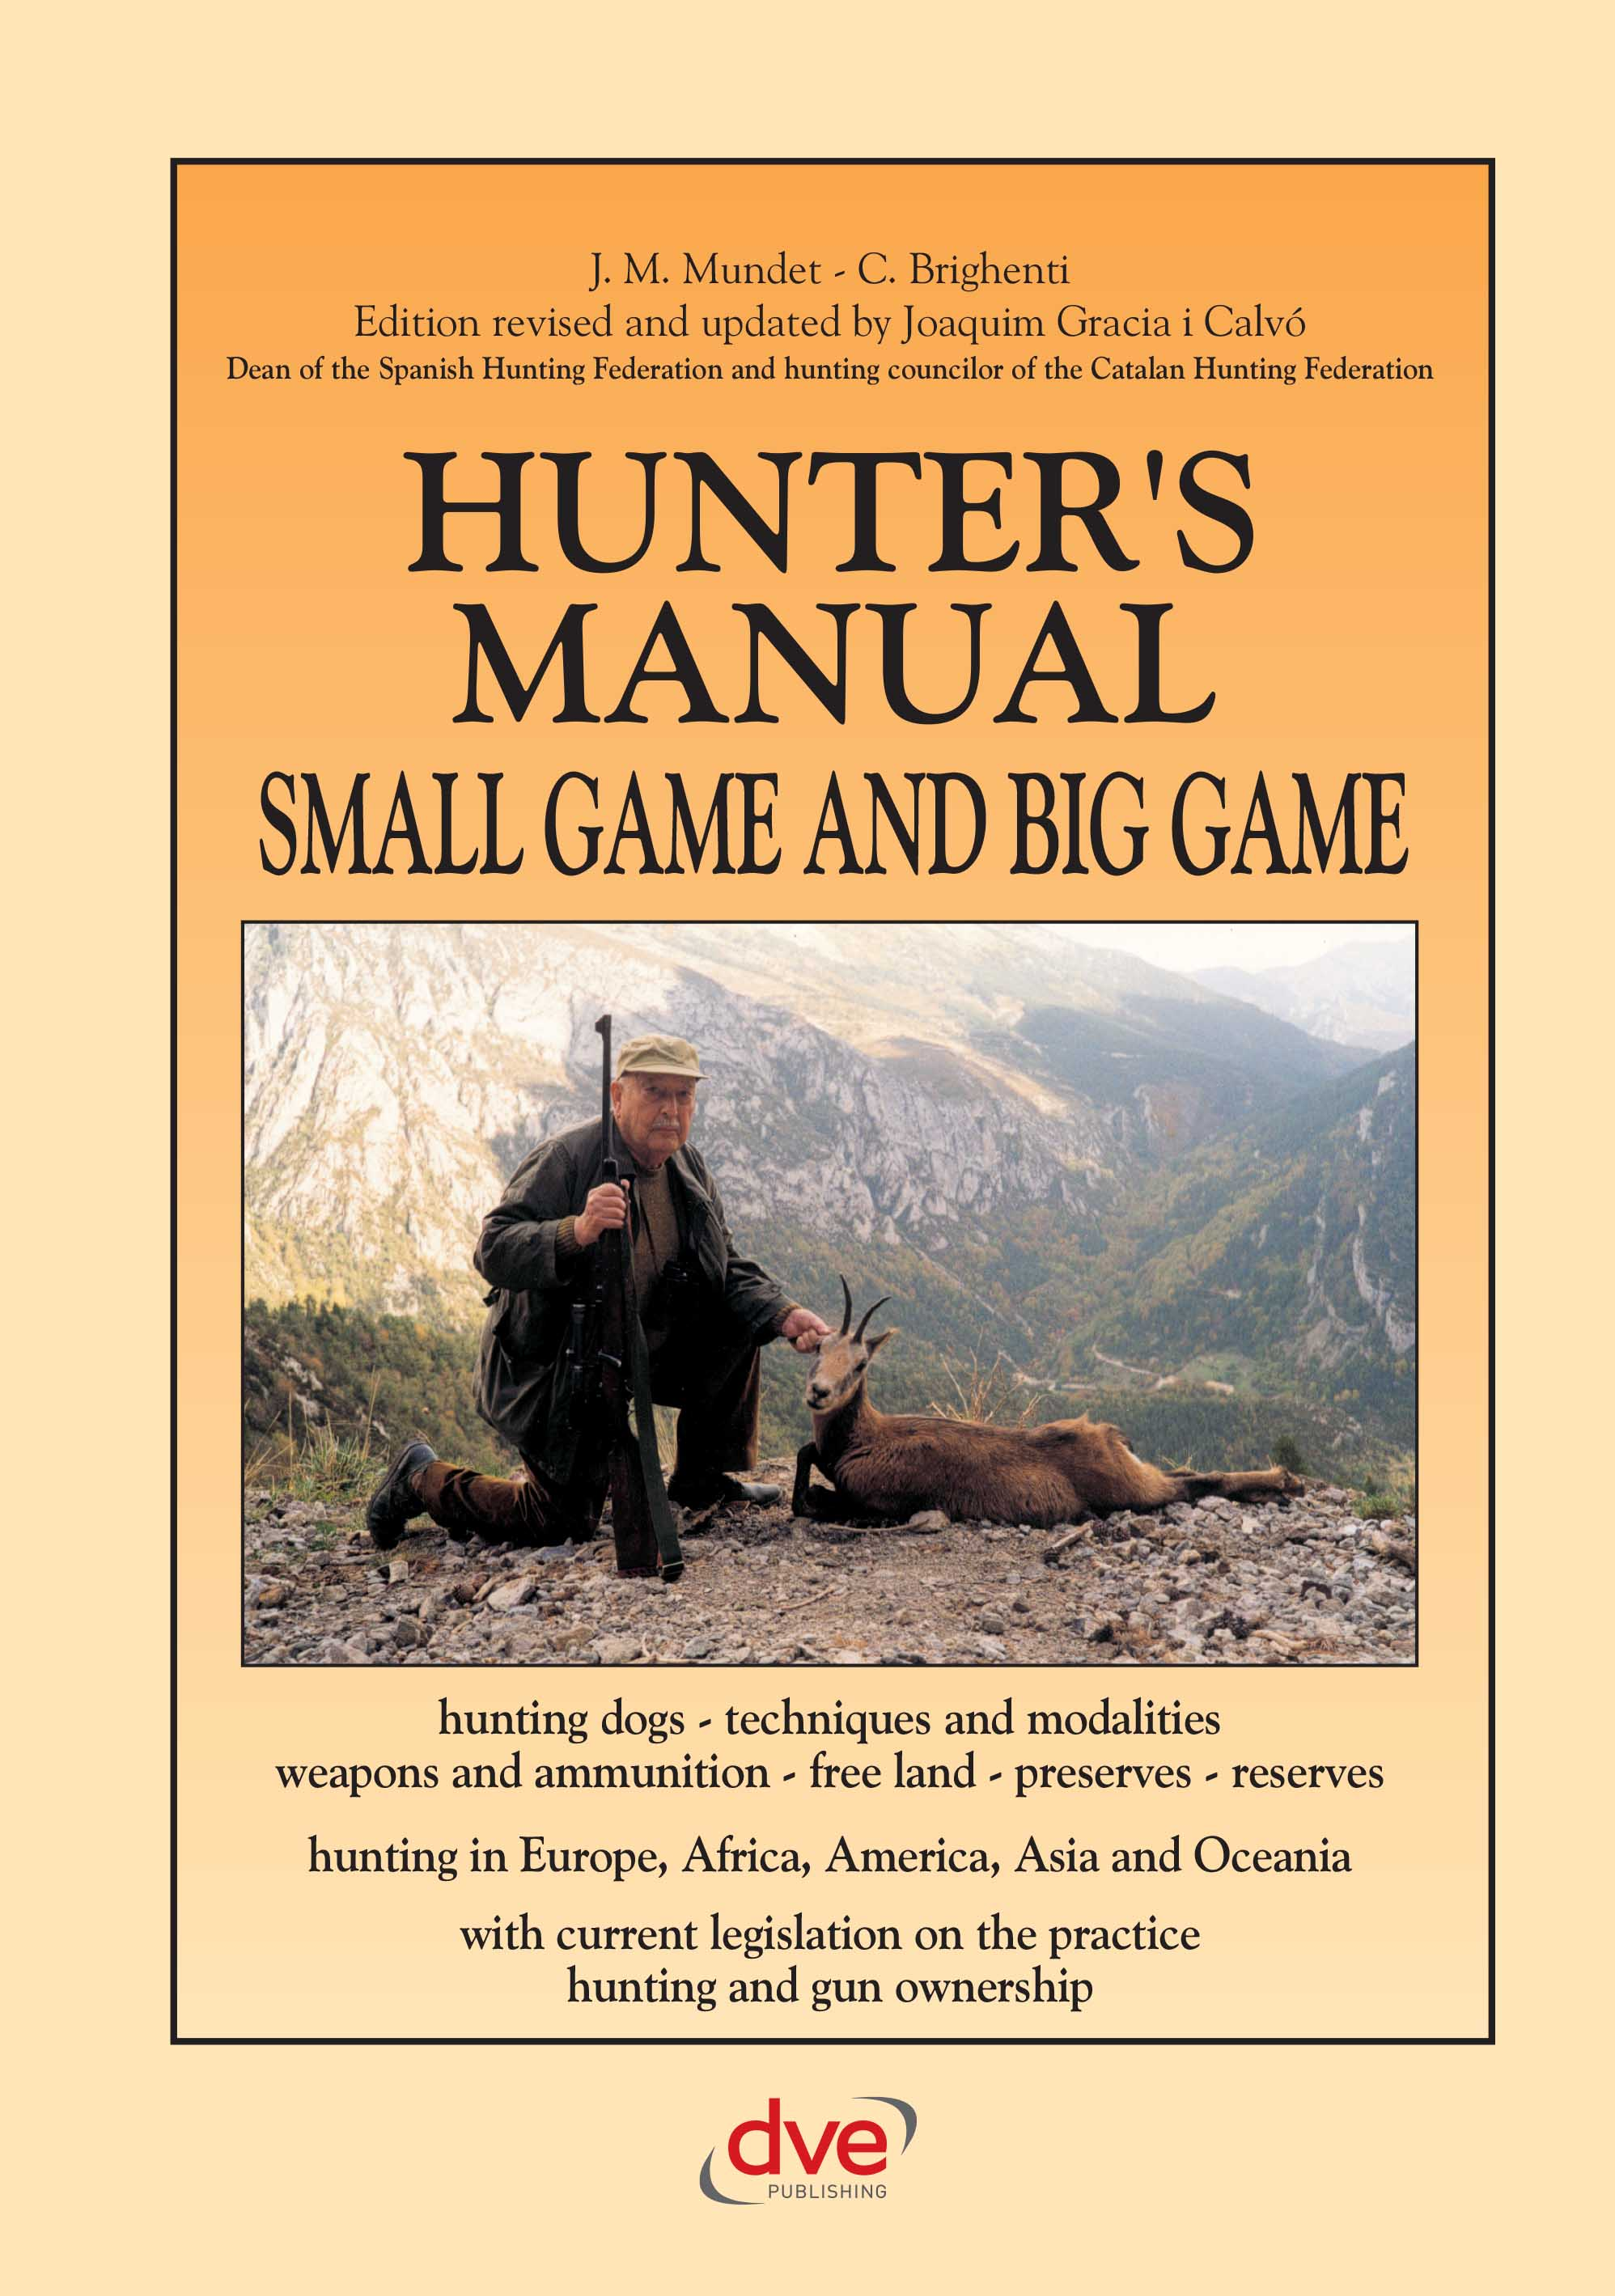 Hunter's Manual Small Game and Big Game